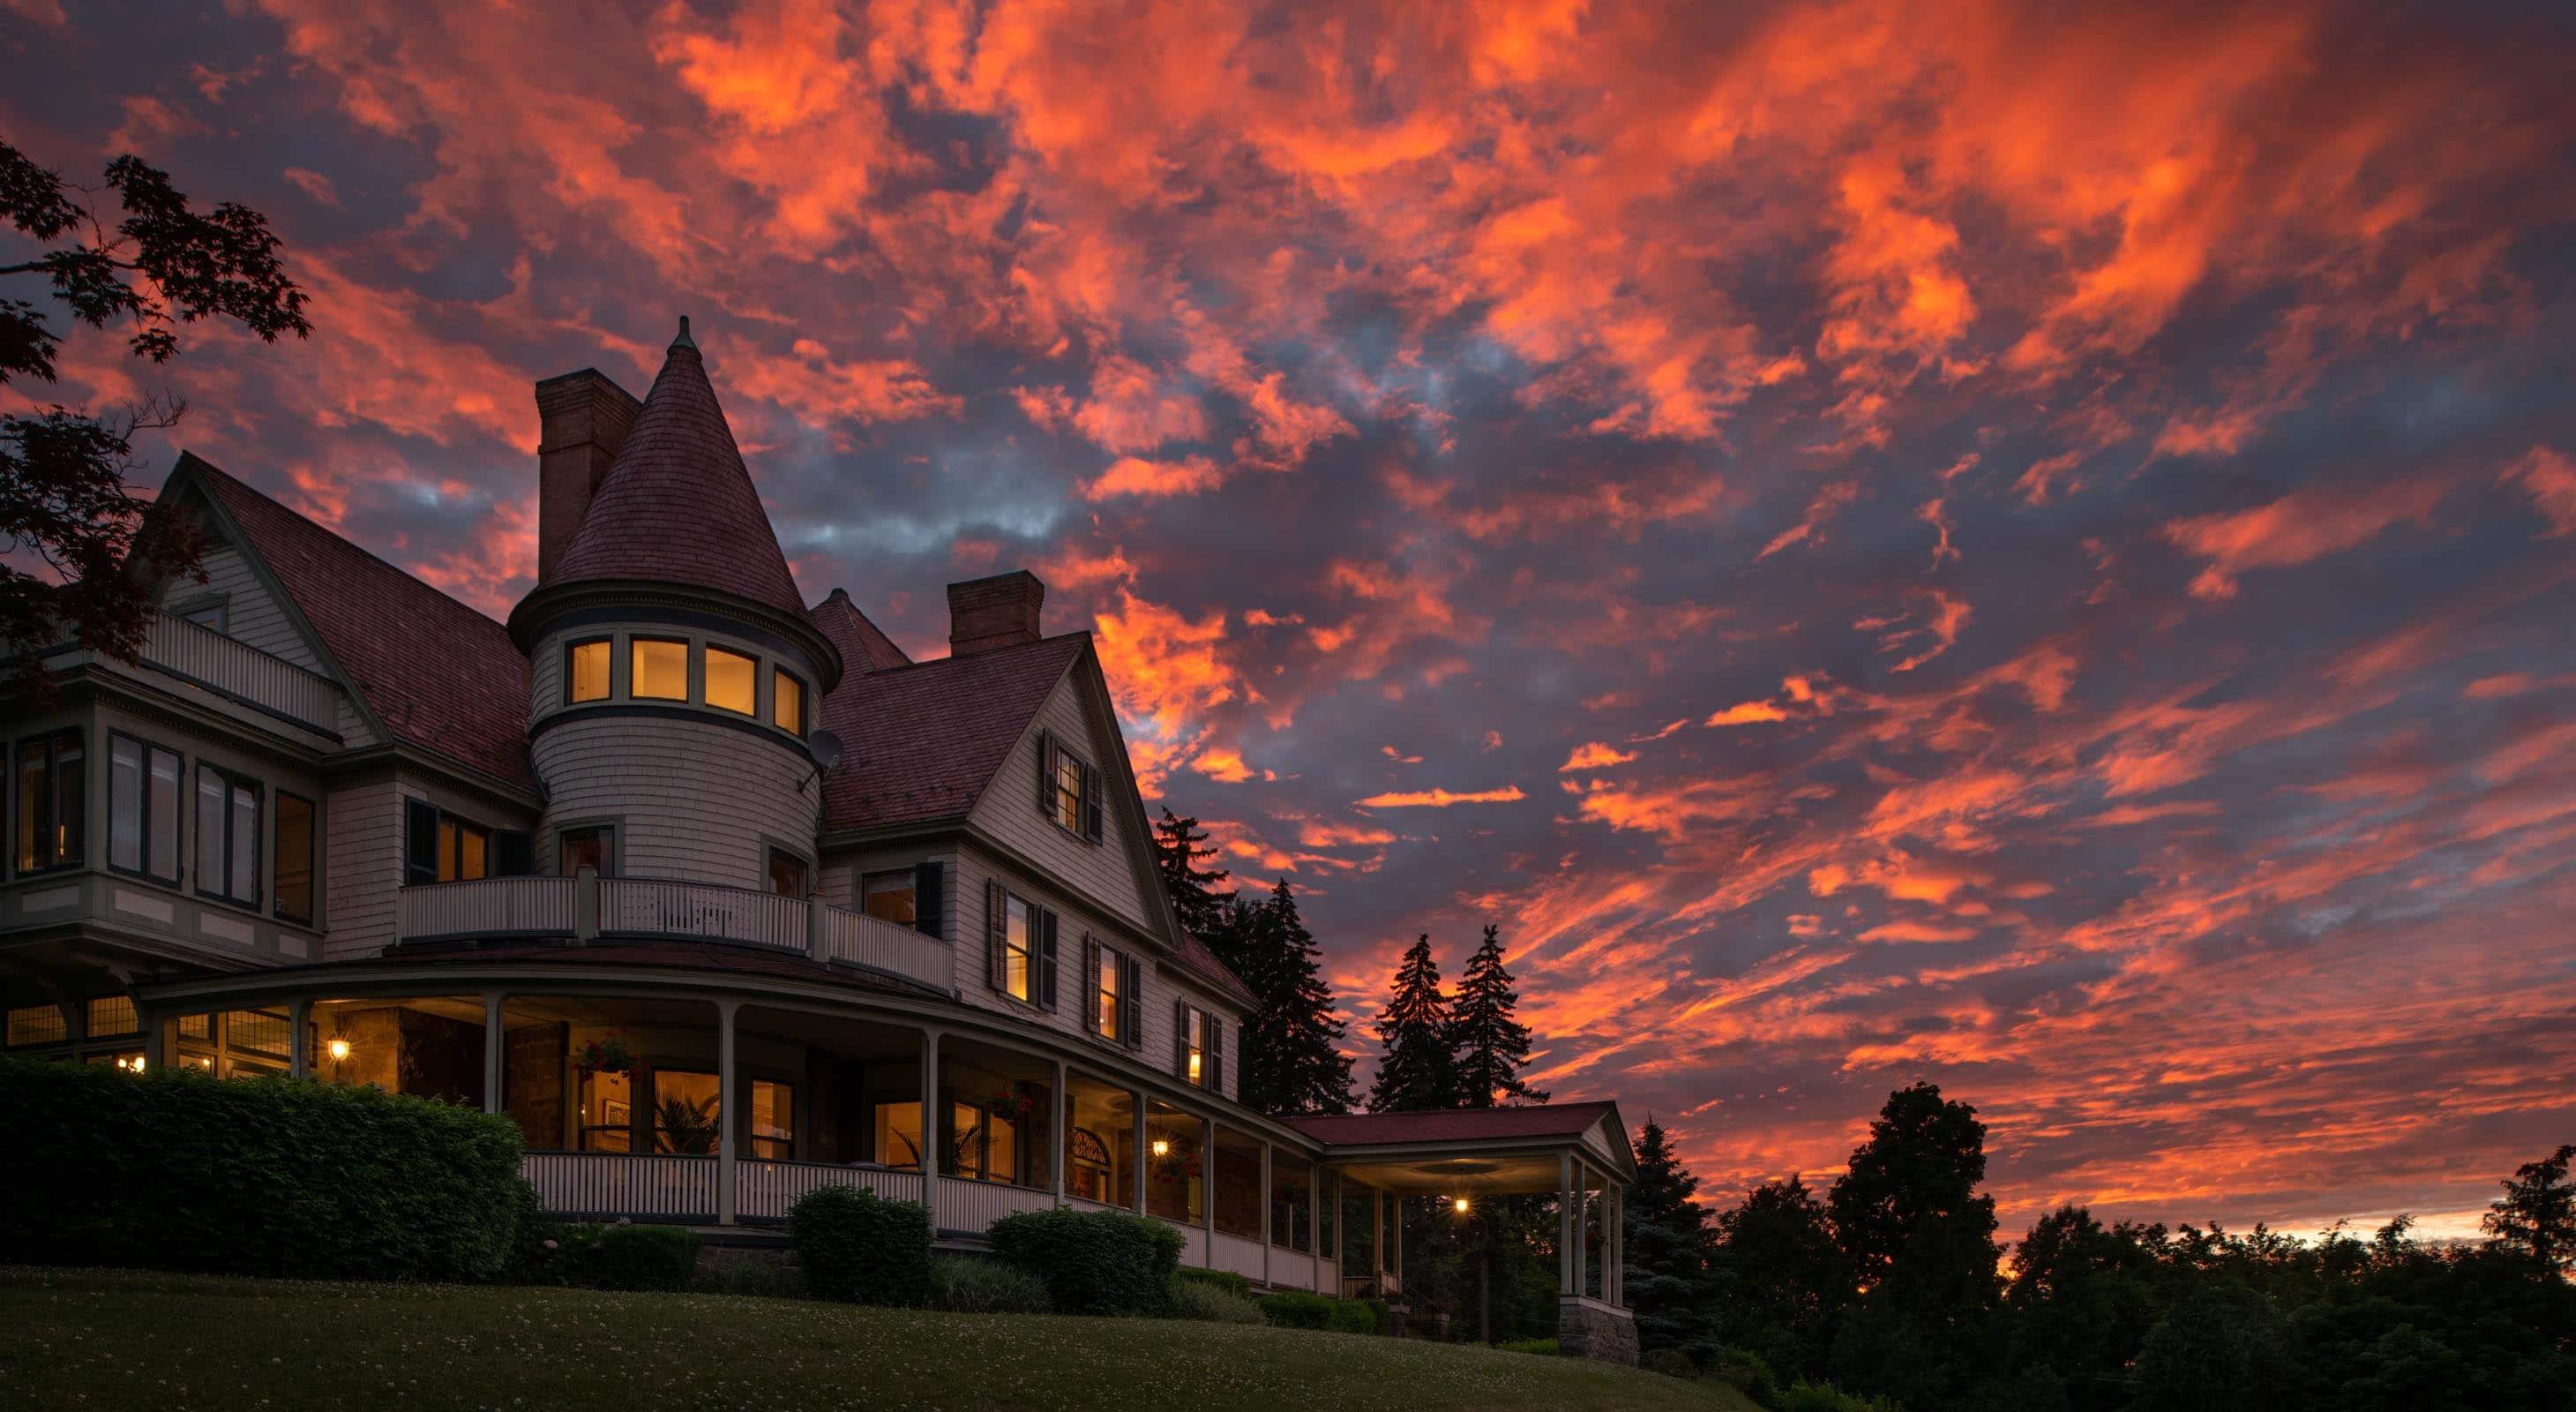 Glorious twilight sky at Idlwilde Inn